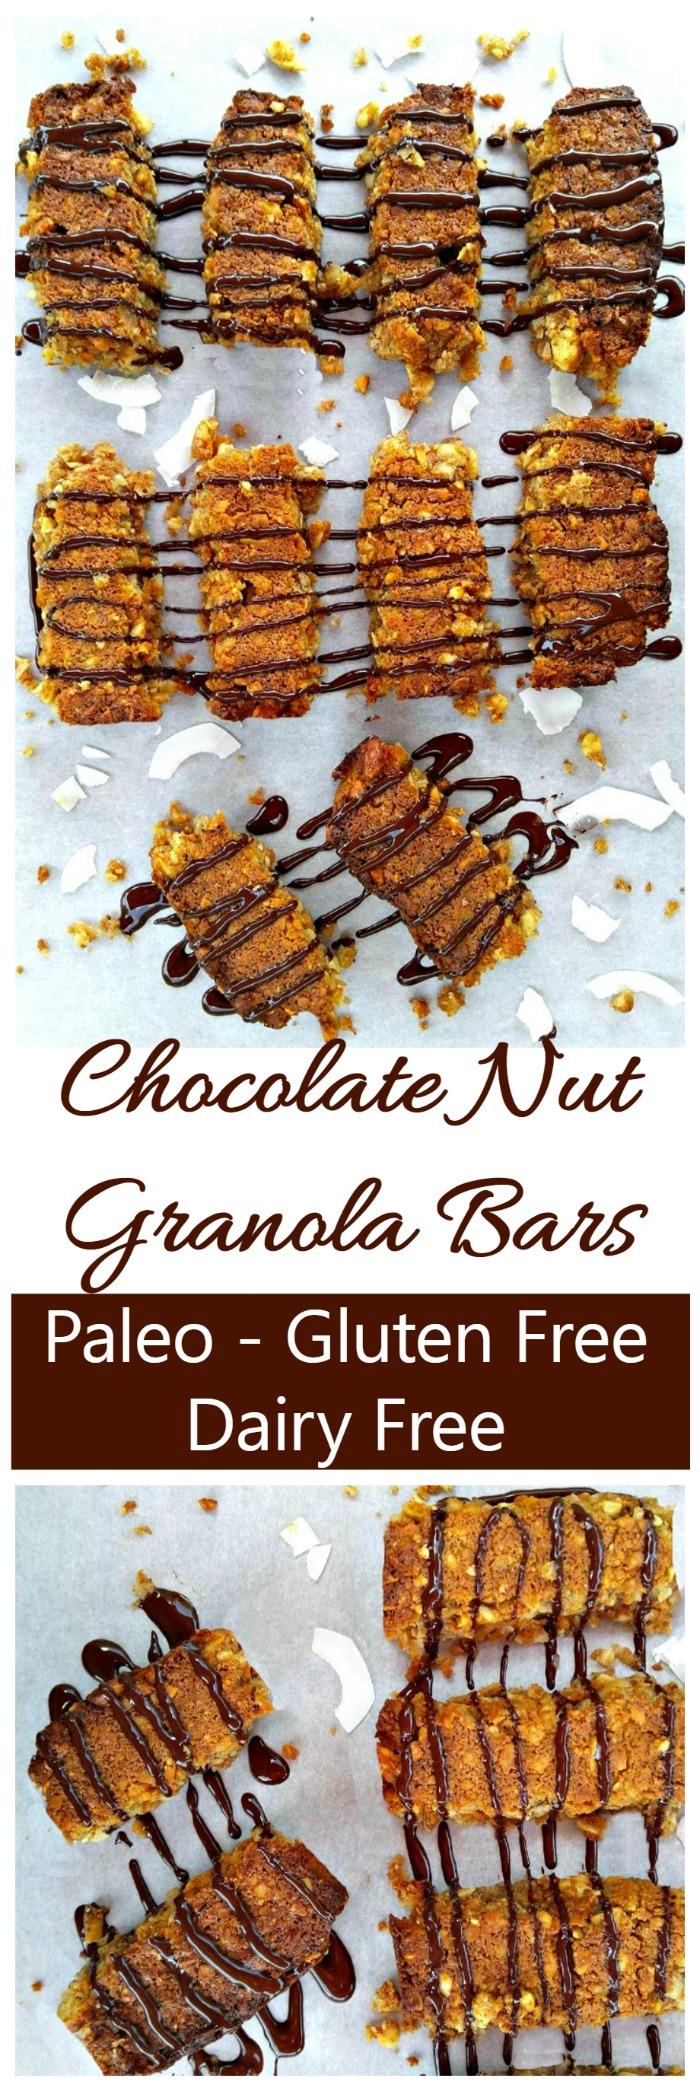 Chocolate Nut Granola Bars - Paleo - Gluten Free